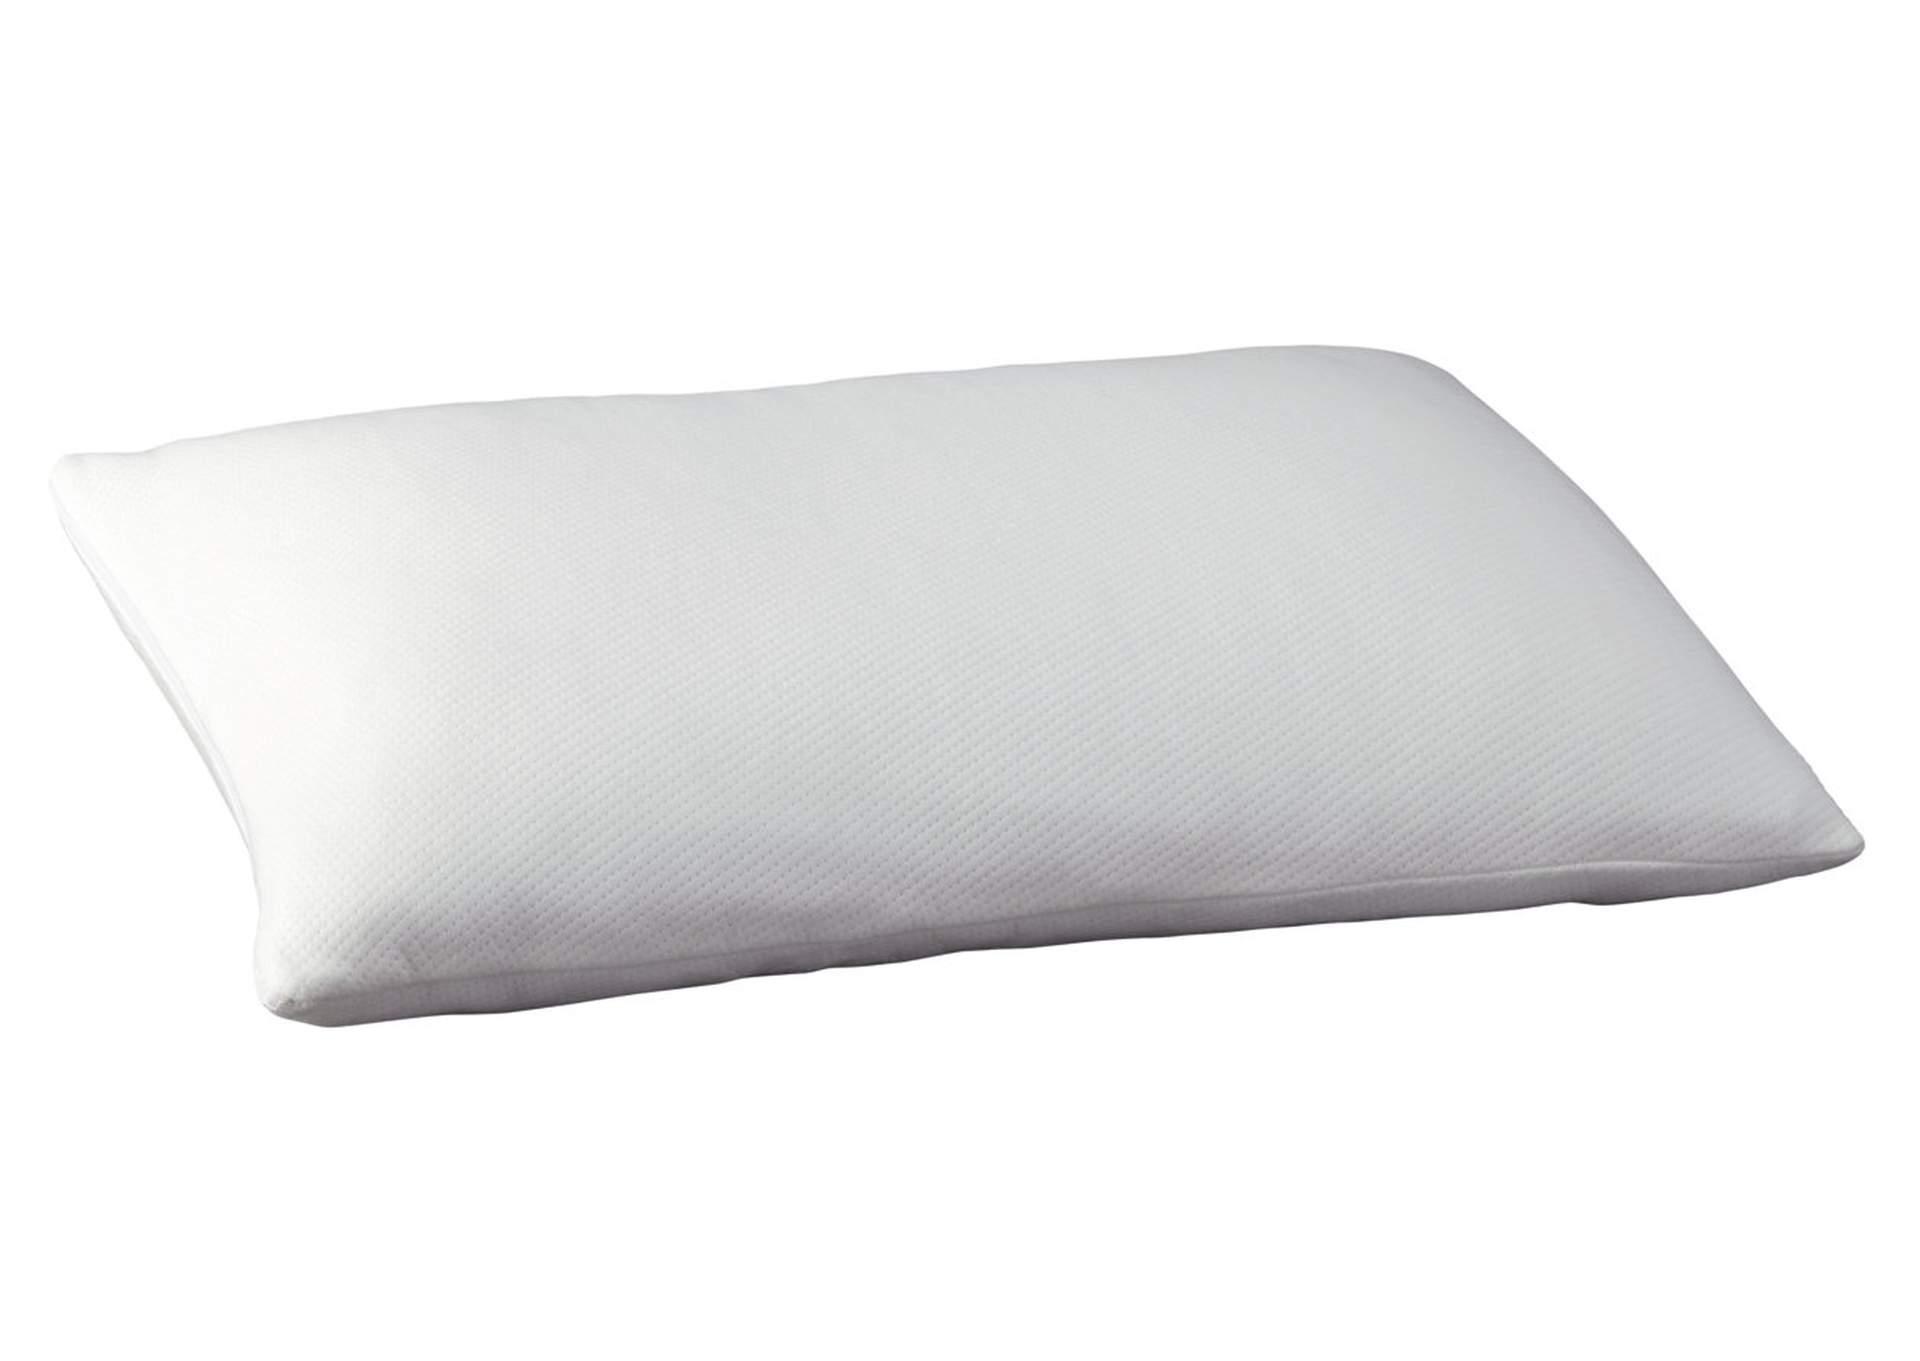 Promotional 低反発フォーム(メモリーフォーム)枕